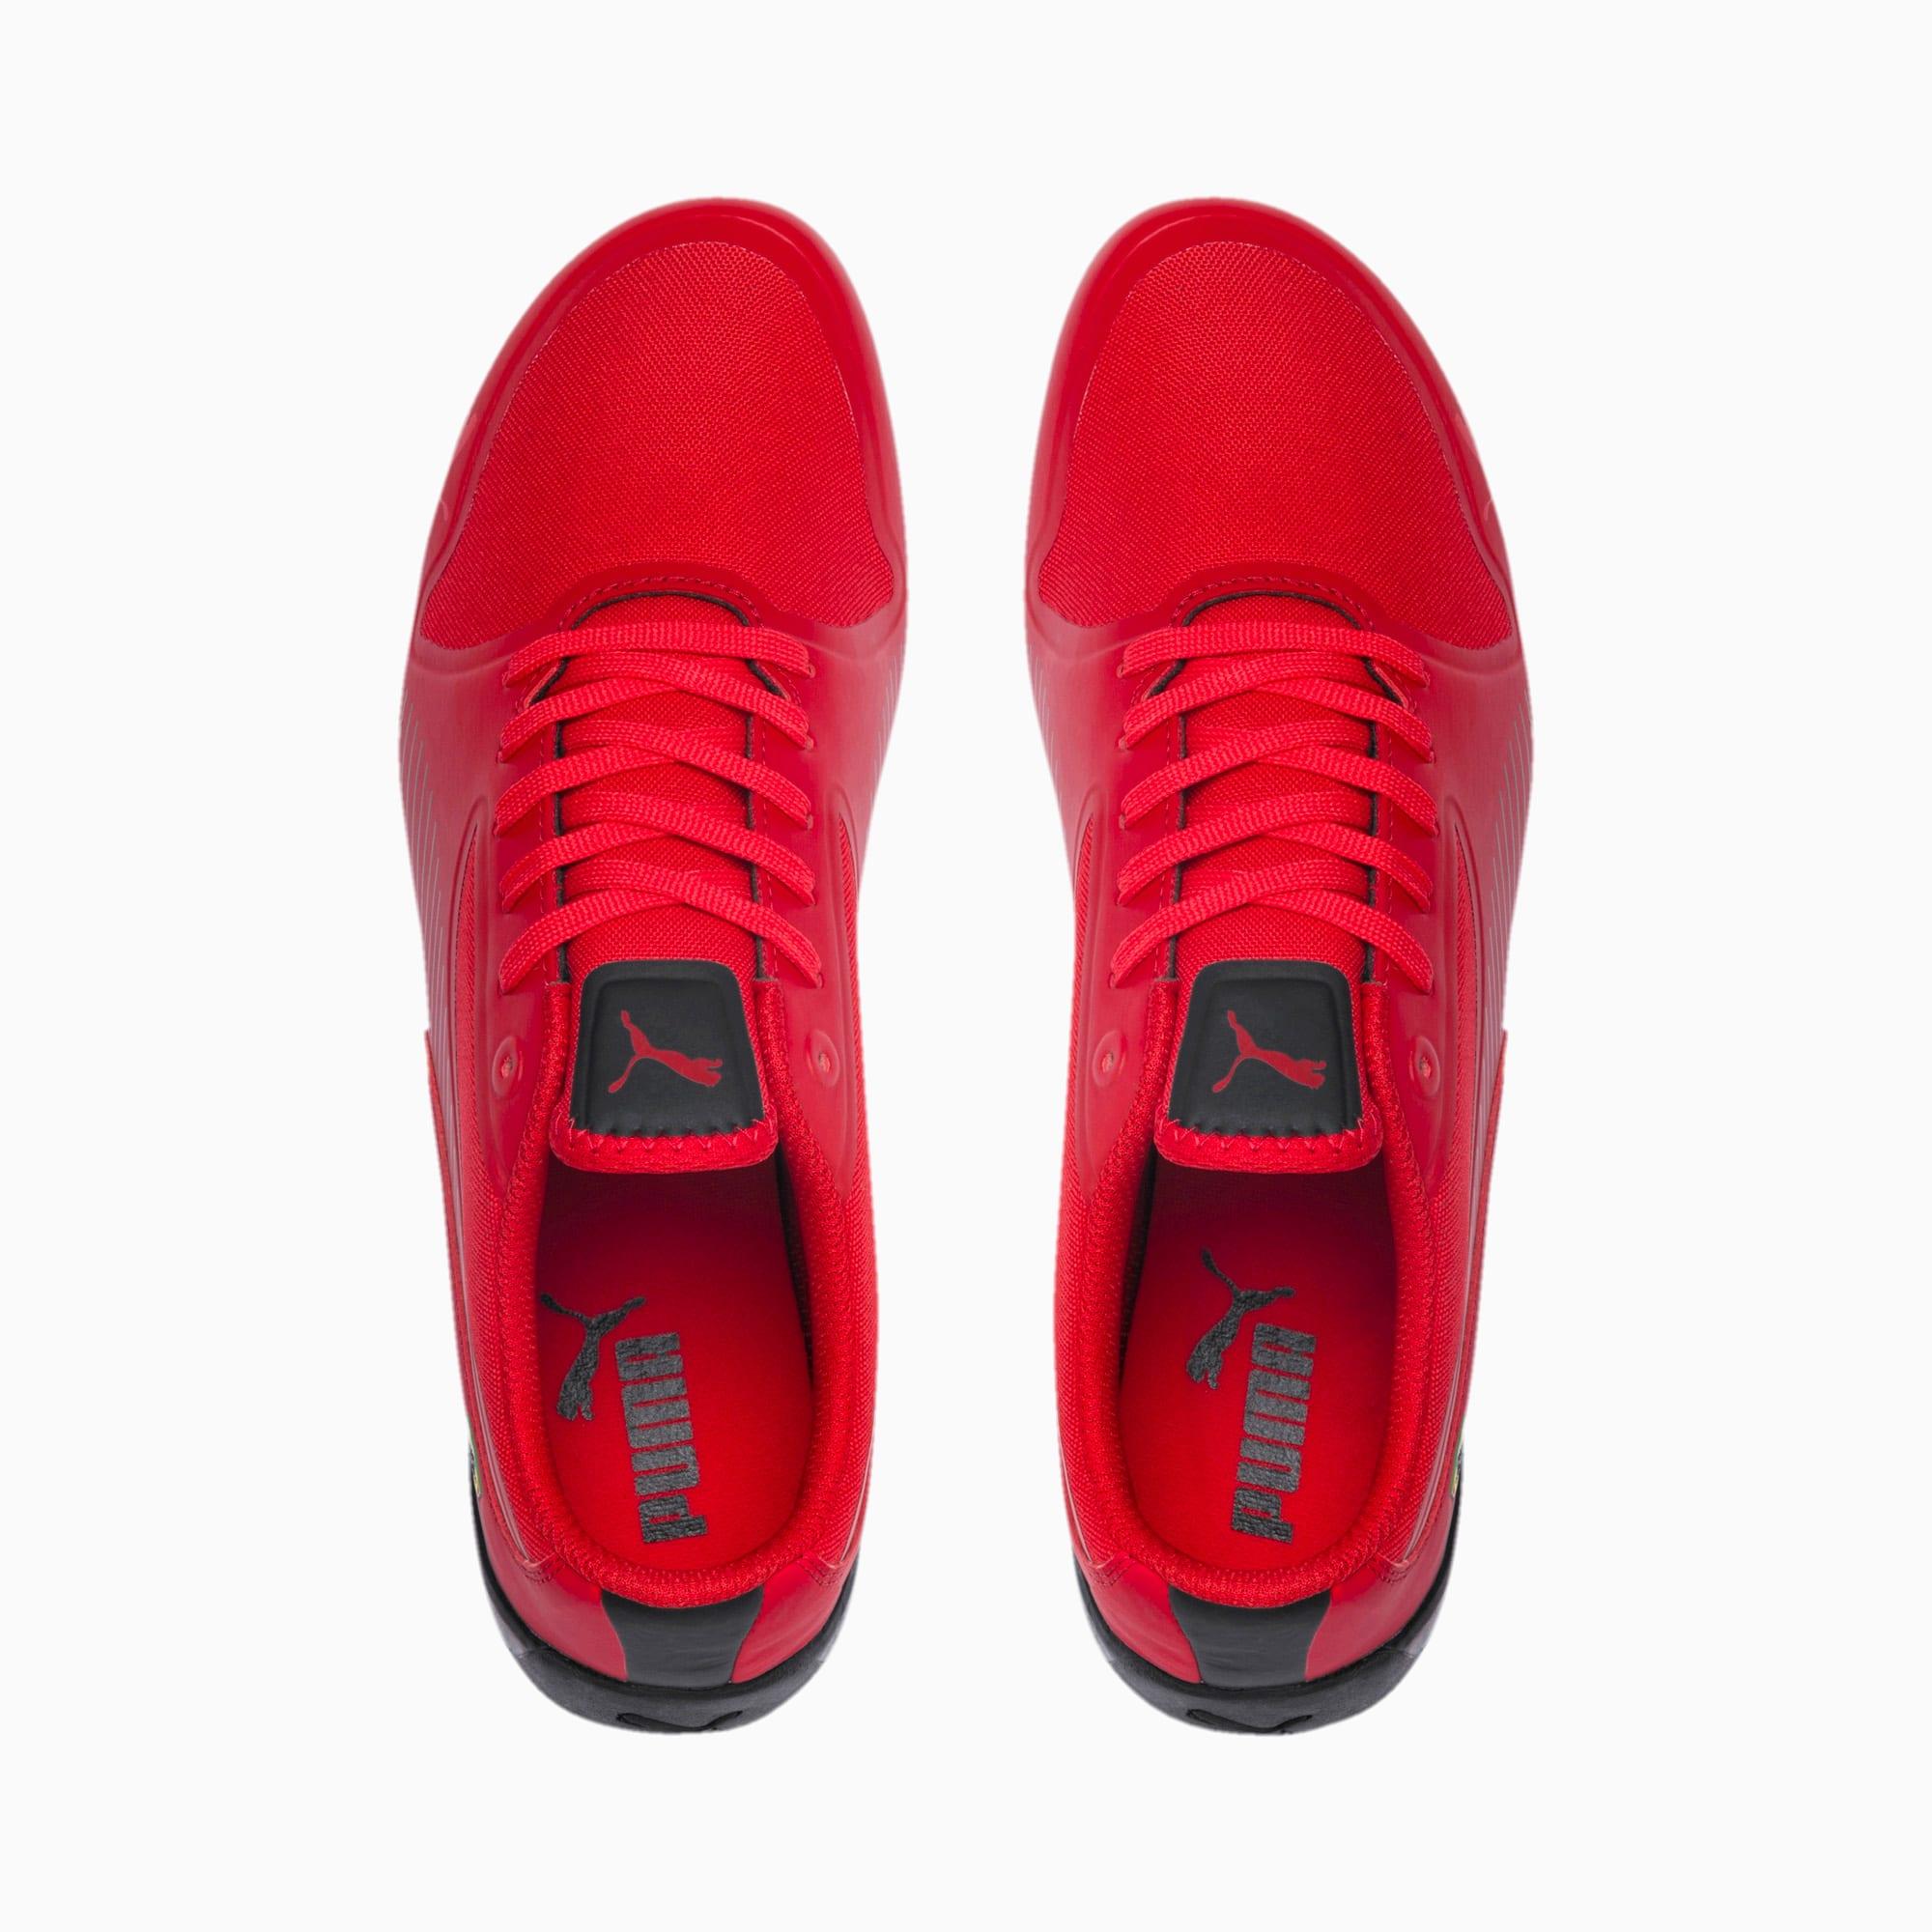 PUMA Scuderia Ferrari Drift Cat 7 Shoes Men